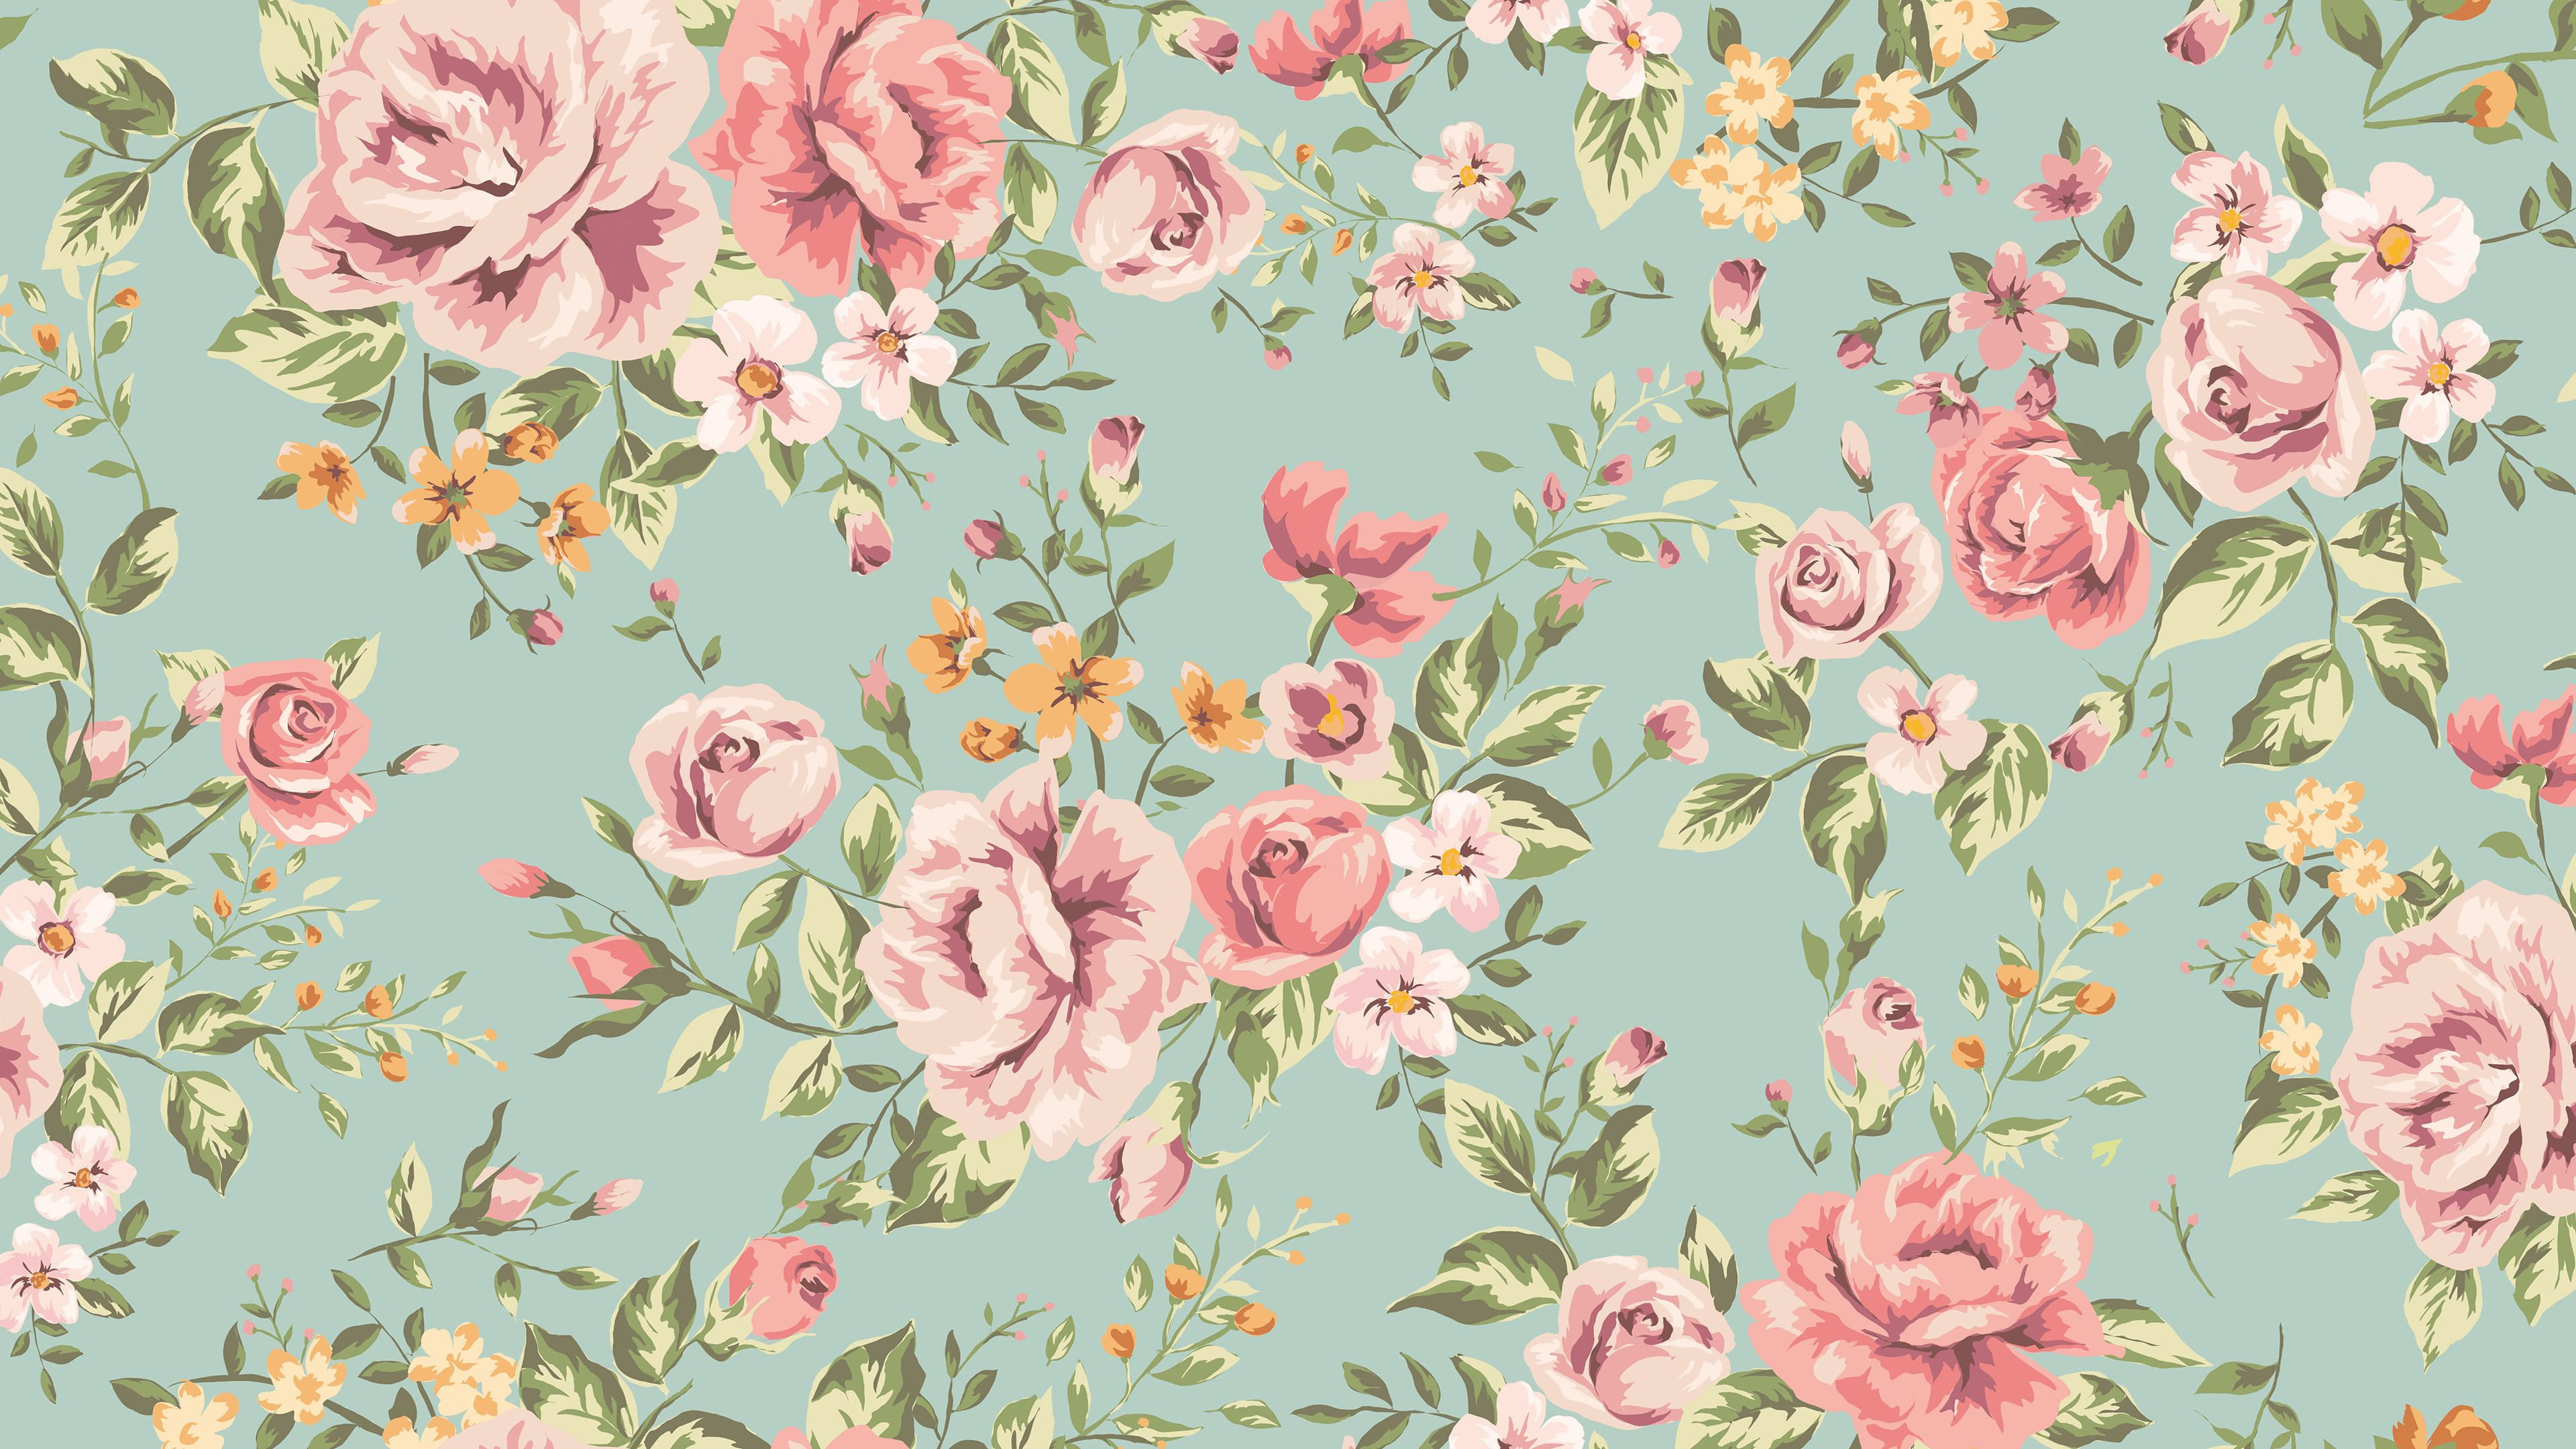 Vintage Floral Pattern Uhd 4k Wallpaper Pixelz In 2020 Vintage Flowers Wallpaper Flower Wallpaper Vintage Flowers